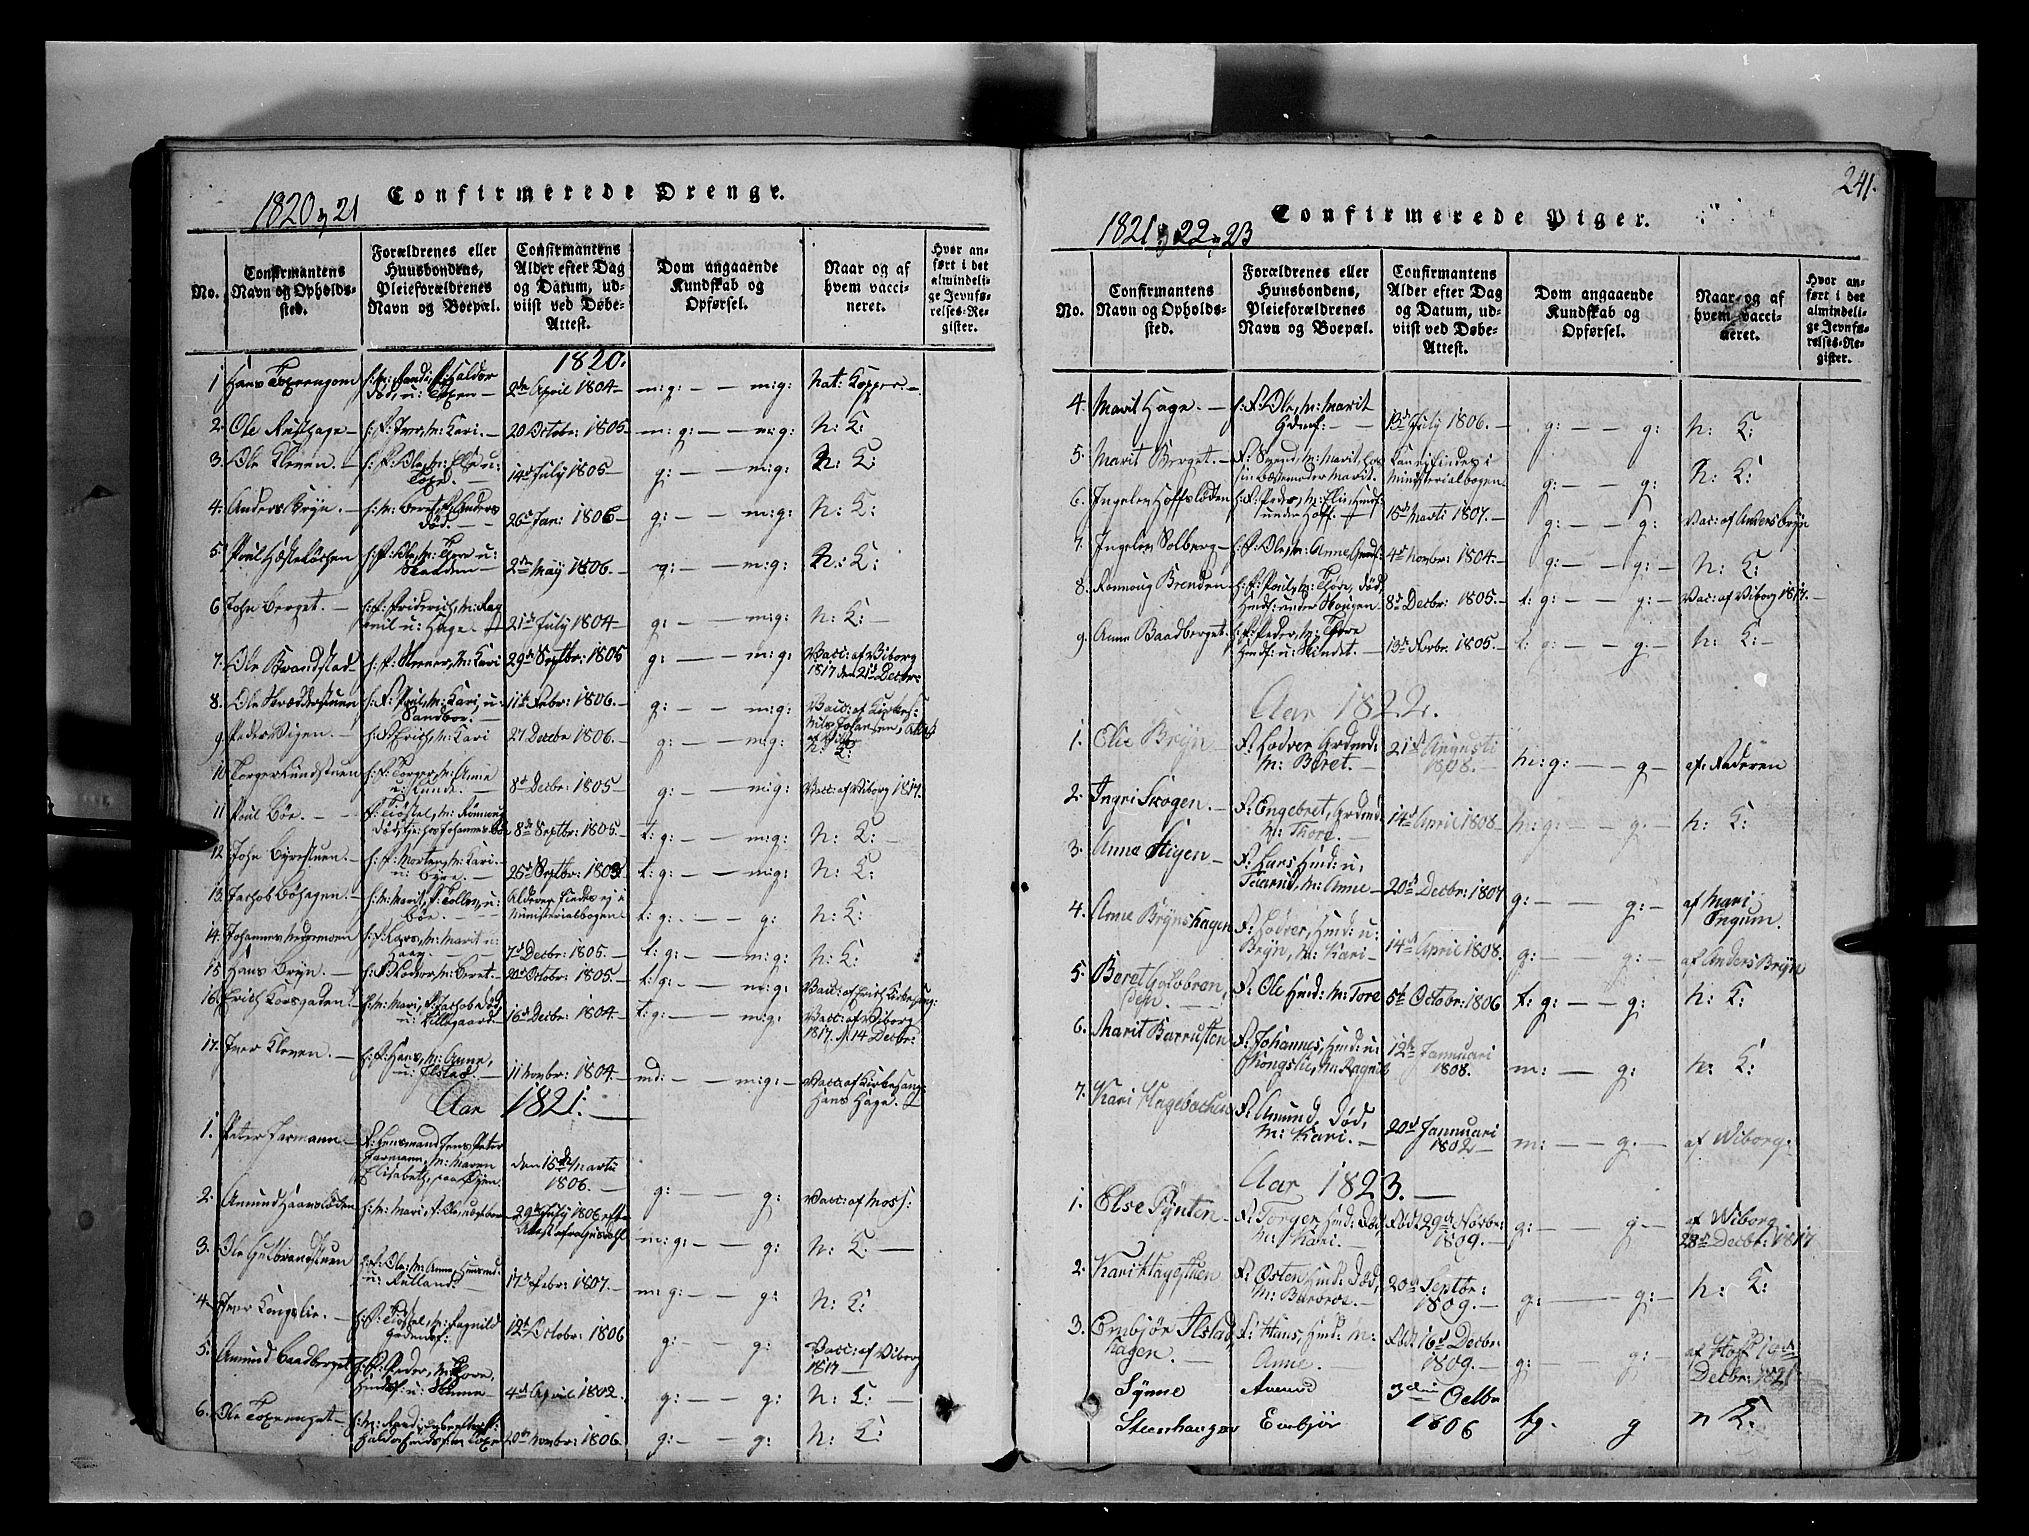 SAH, Fron prestekontor, H/Ha/Hab/L0004: Klokkerbok nr. 4, 1816-1850, s. 241